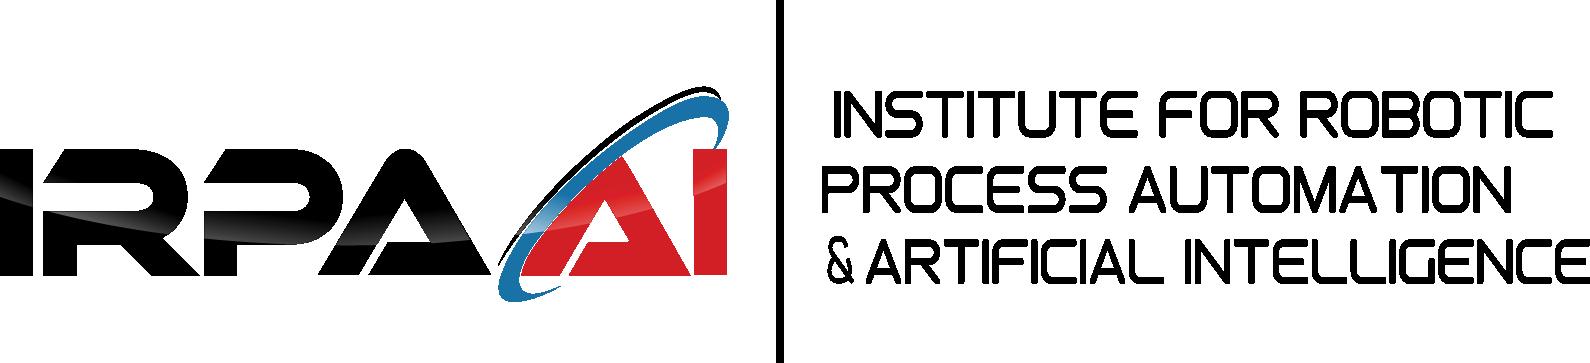 irpa_logo